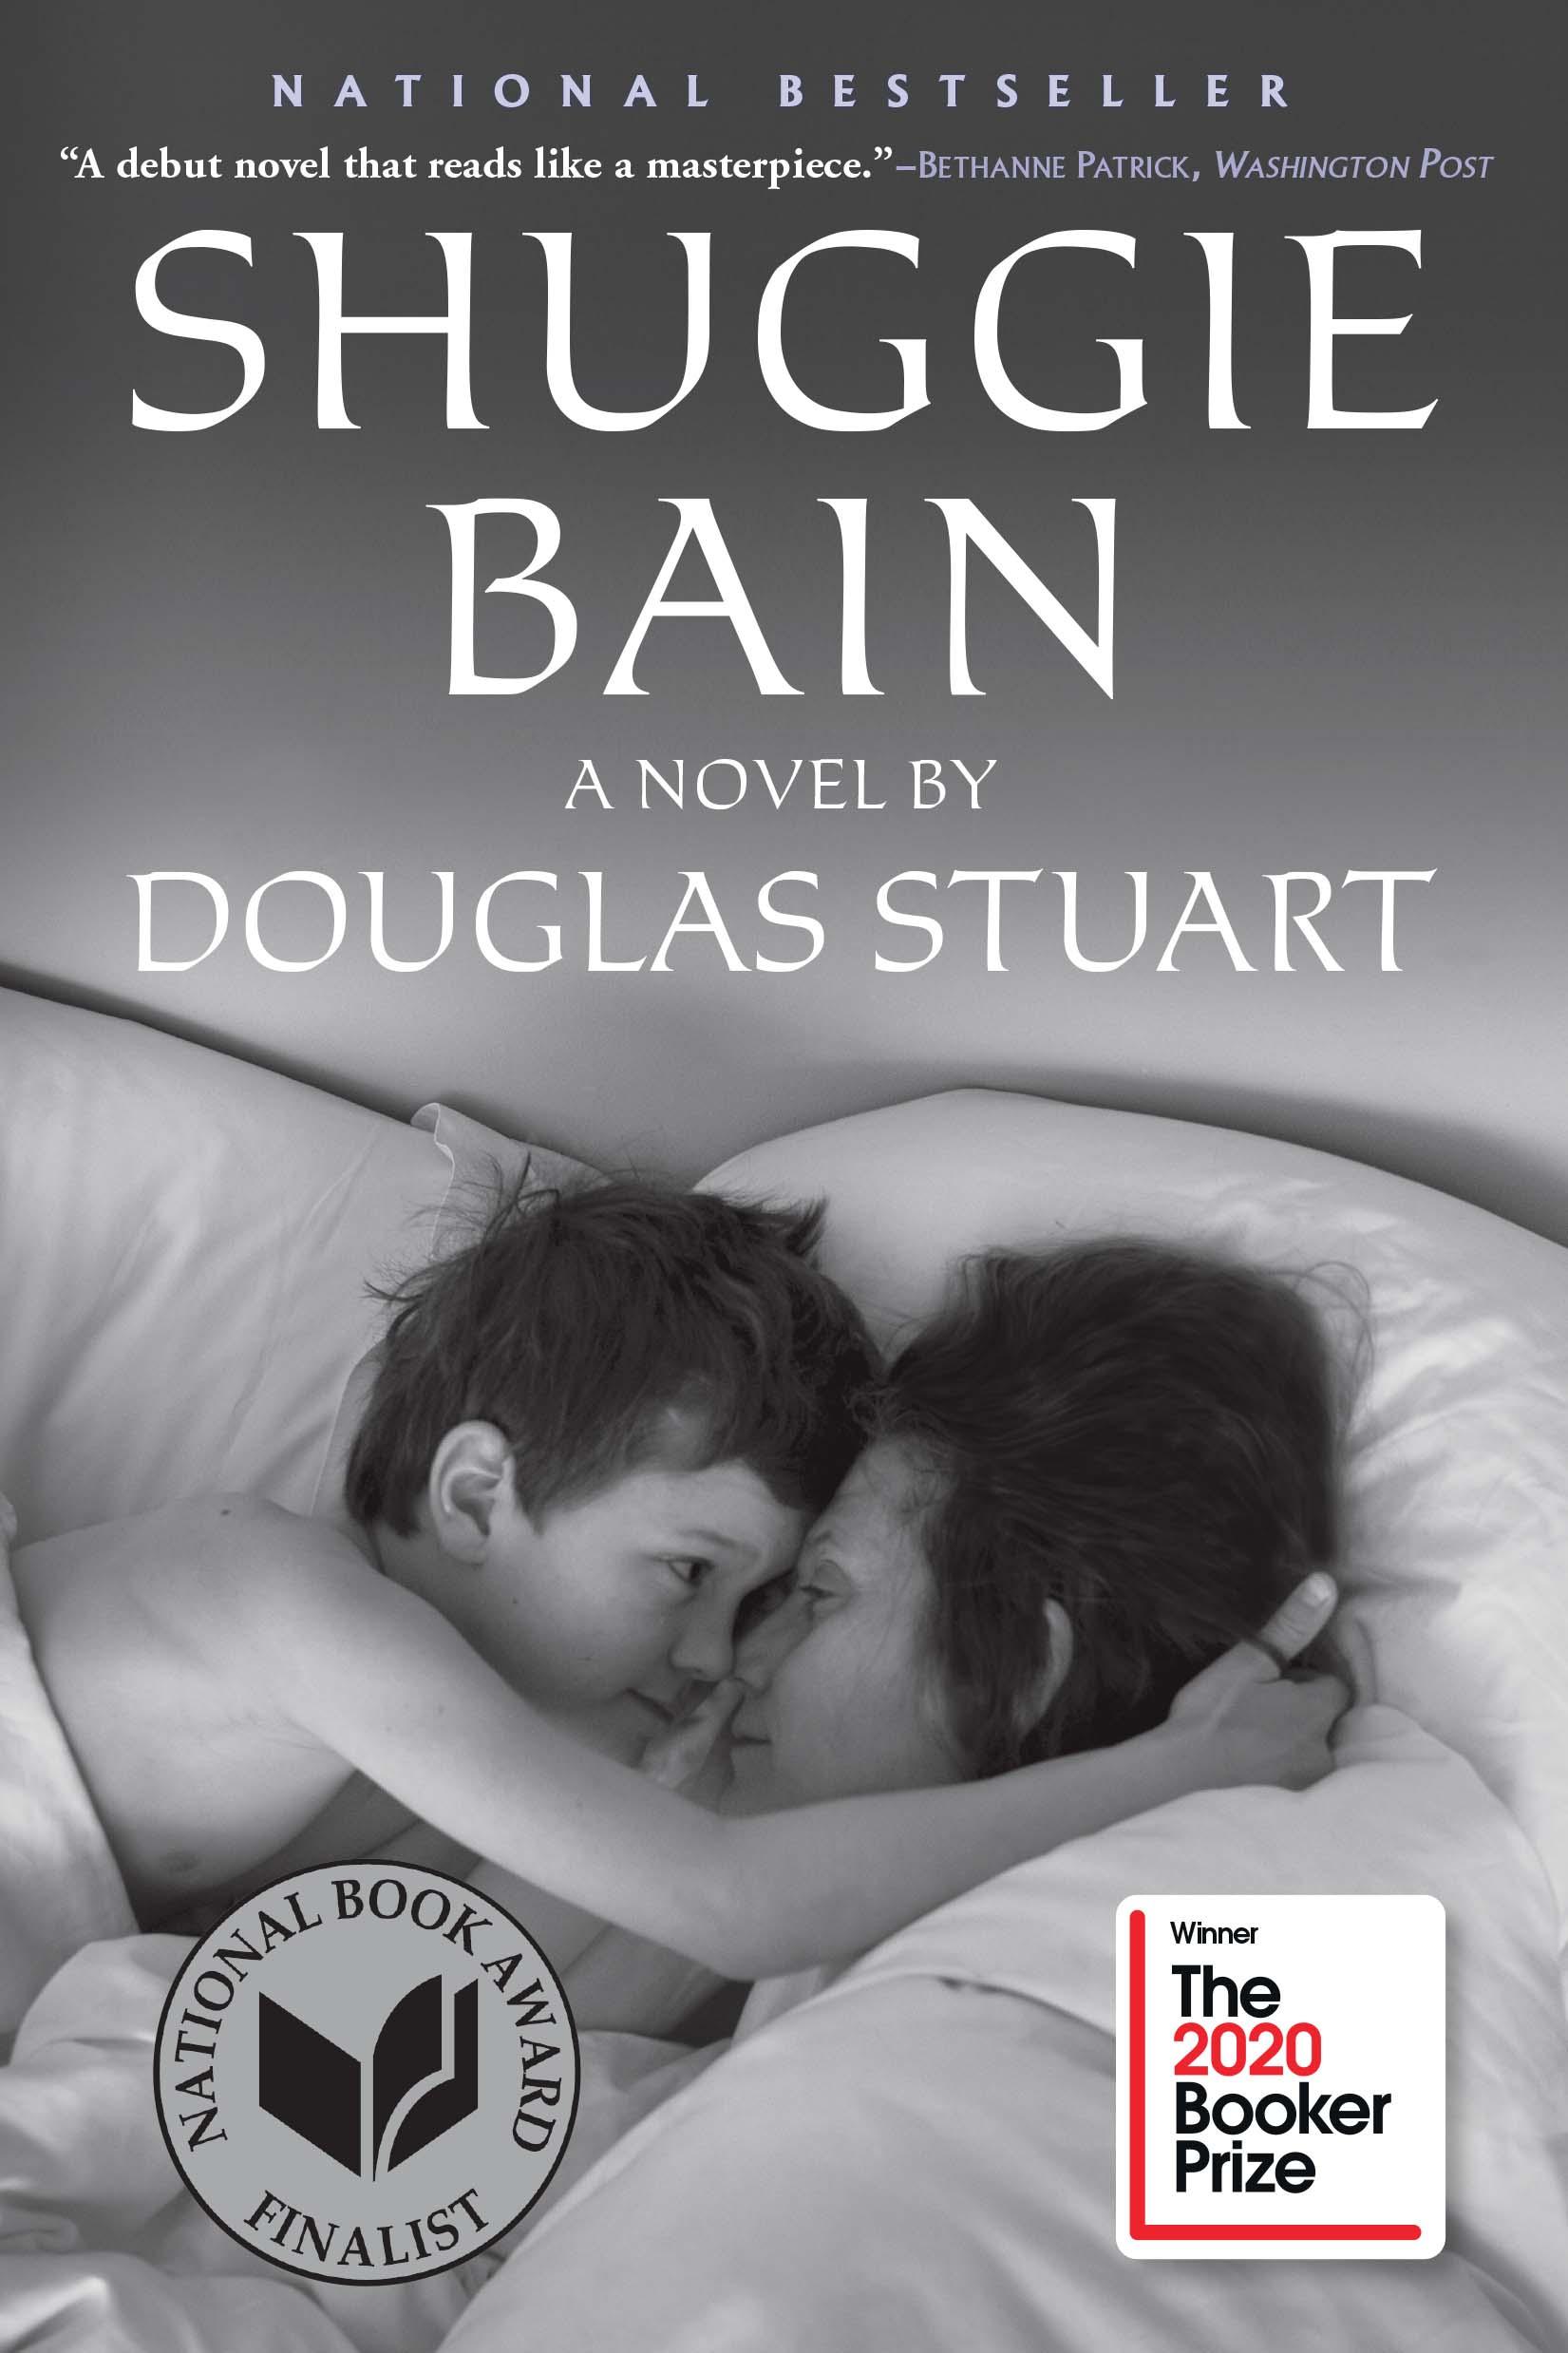 Shuggie Bain A Novel (Booker Prize Winner)